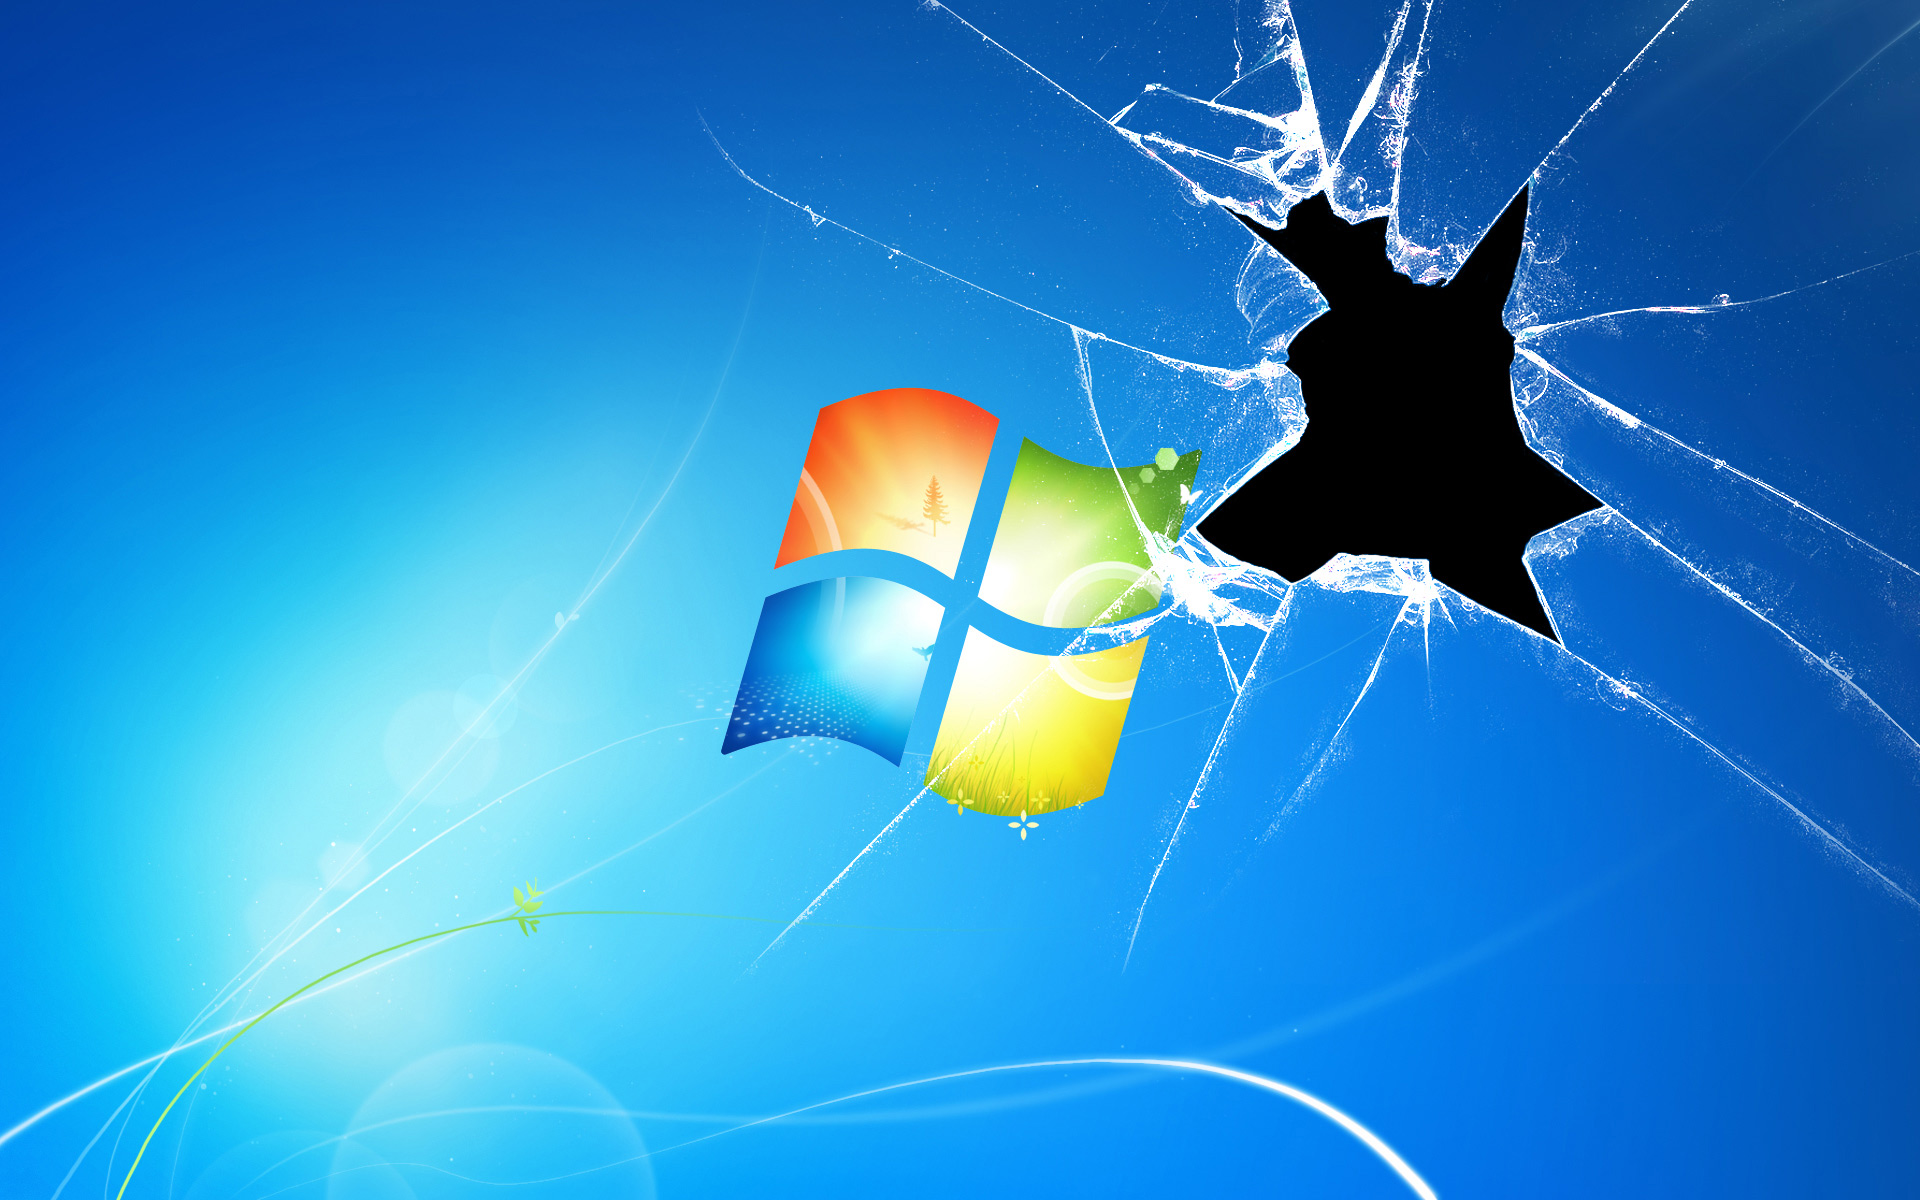 Latest update for windows photo viewer 7 Windows Update - Wikipedia